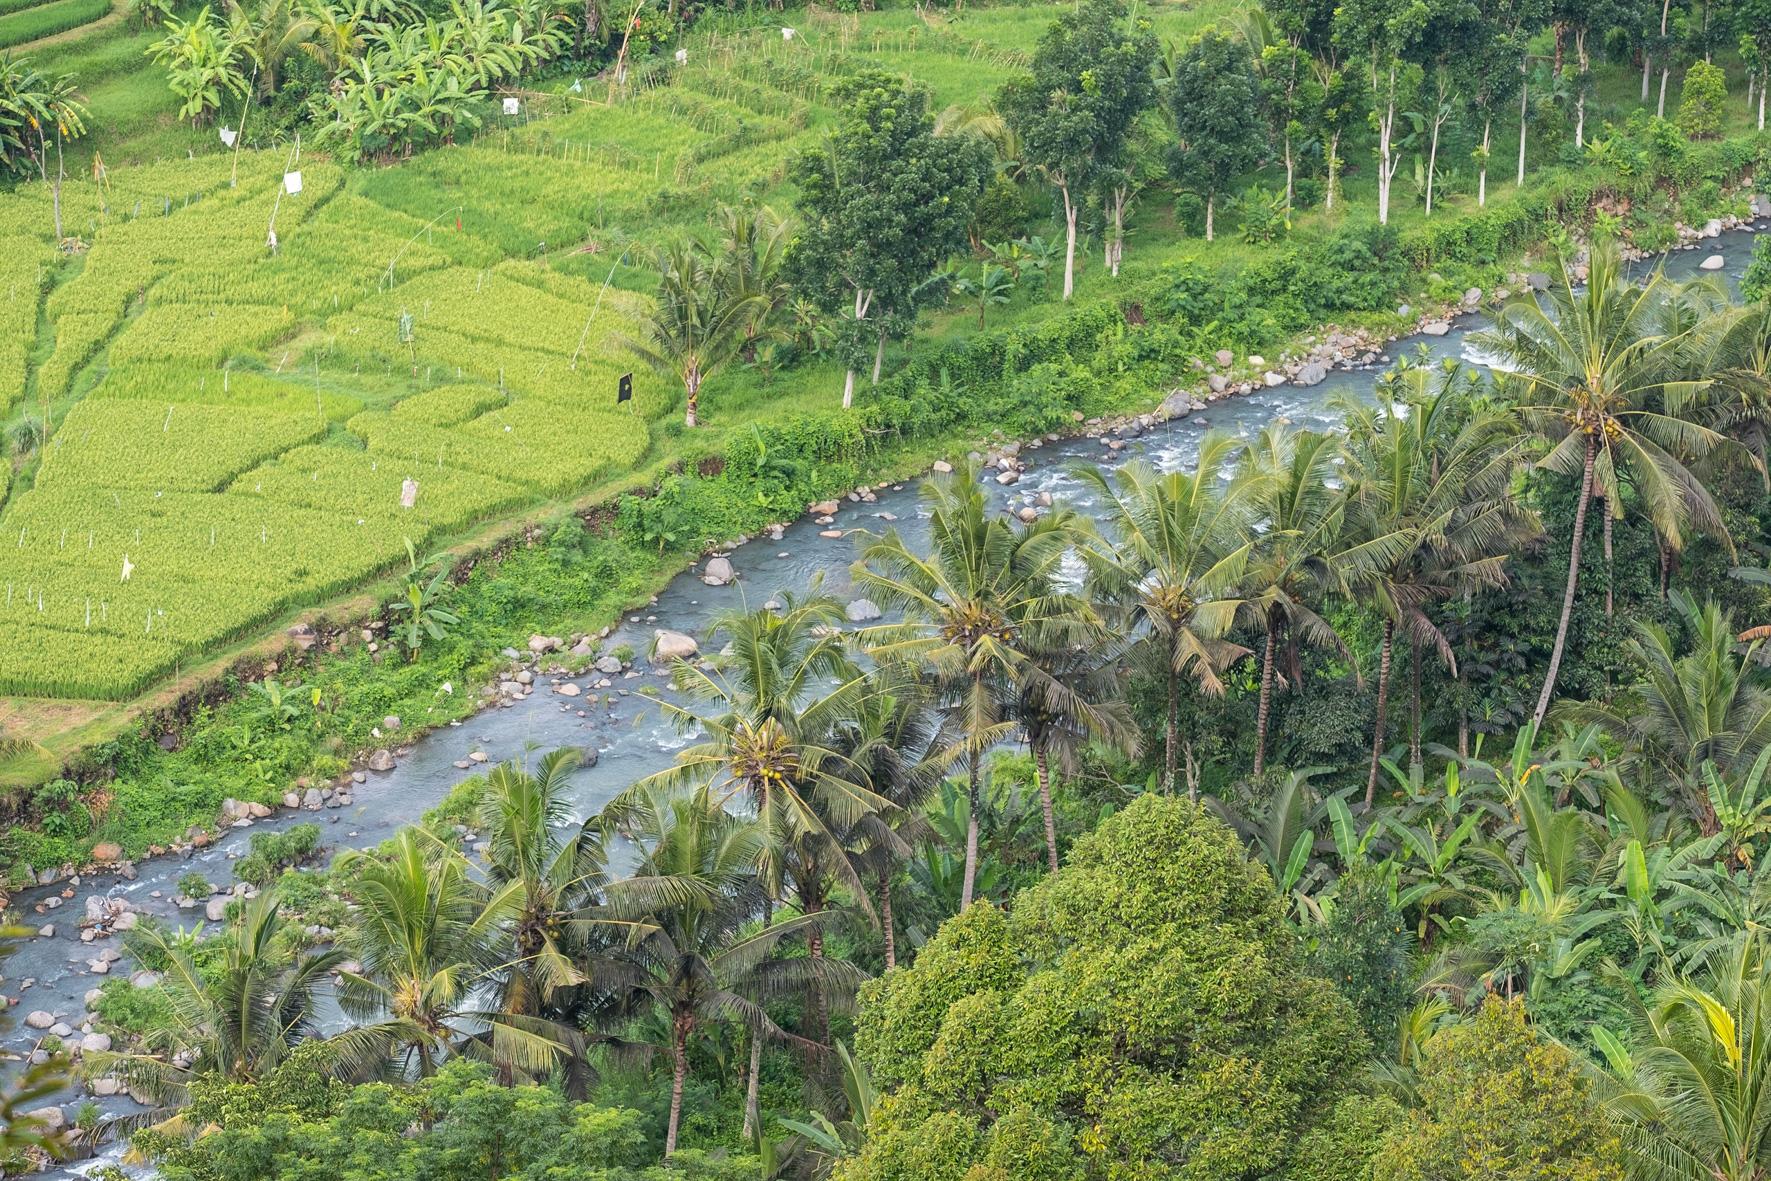 West Bali scenic road-2